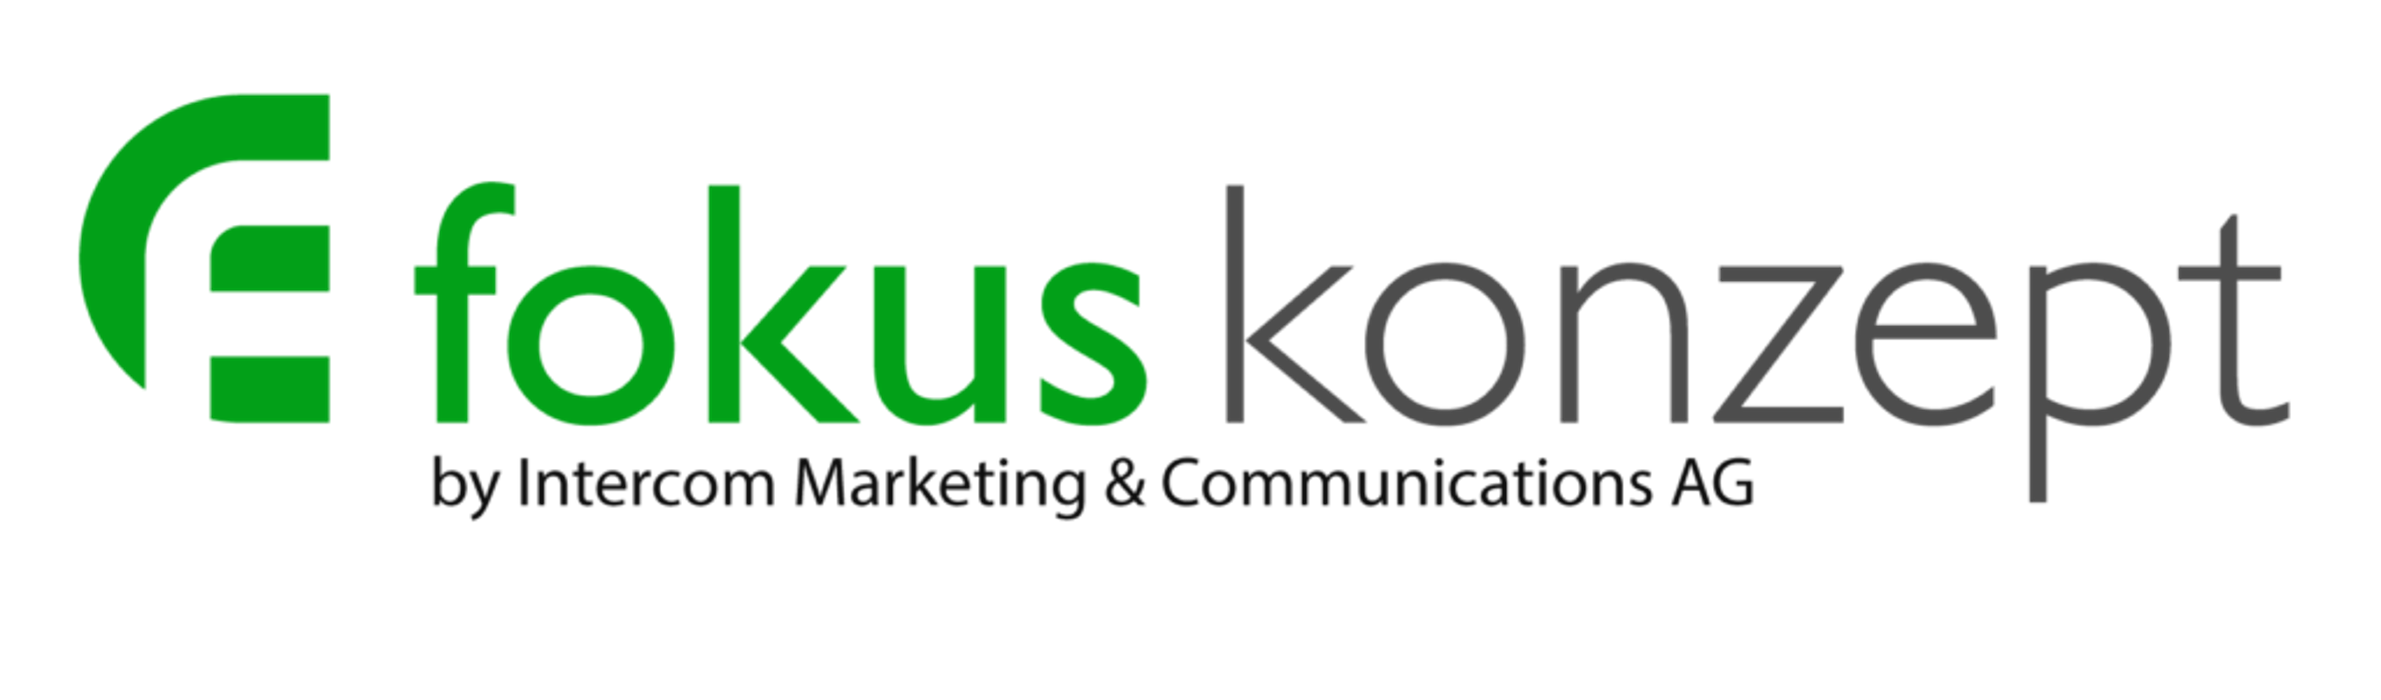 Bild zu fokus konzept by Intercom Marketing & Communications AG in München